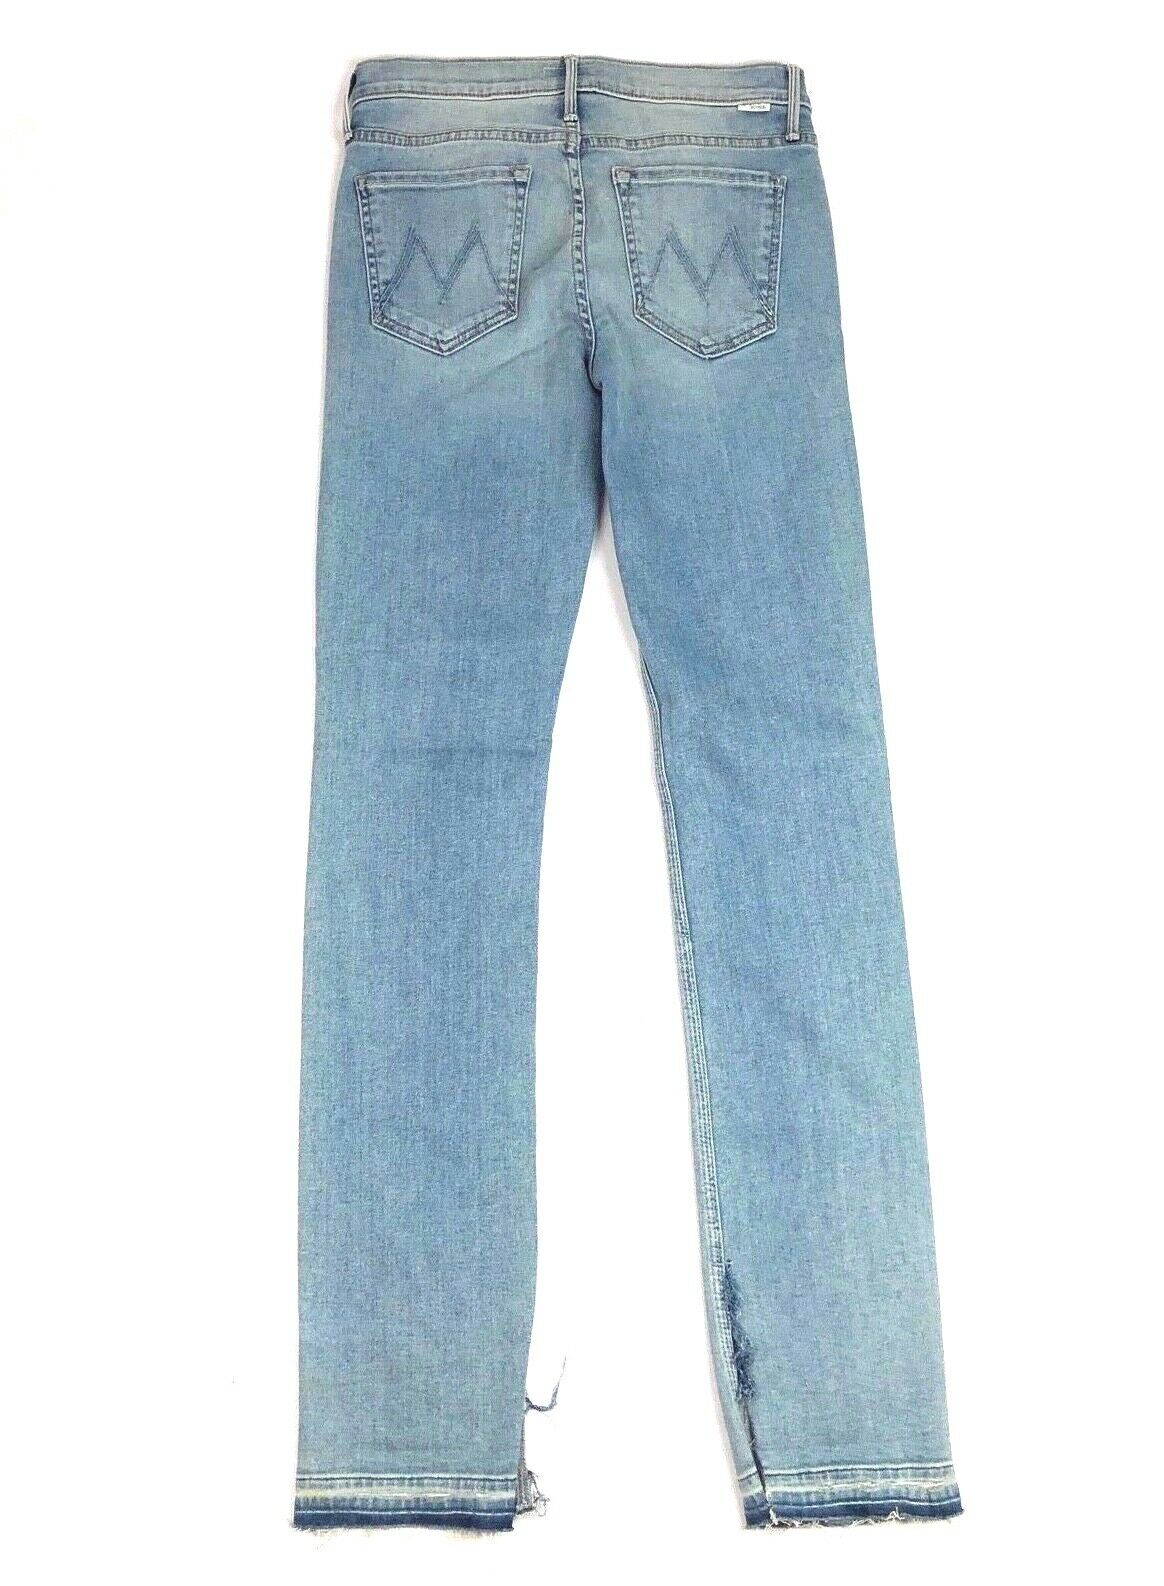 MOTHER Women's Denim RASCAL Slit Undone Hem Wild at Heart Jeans Pants